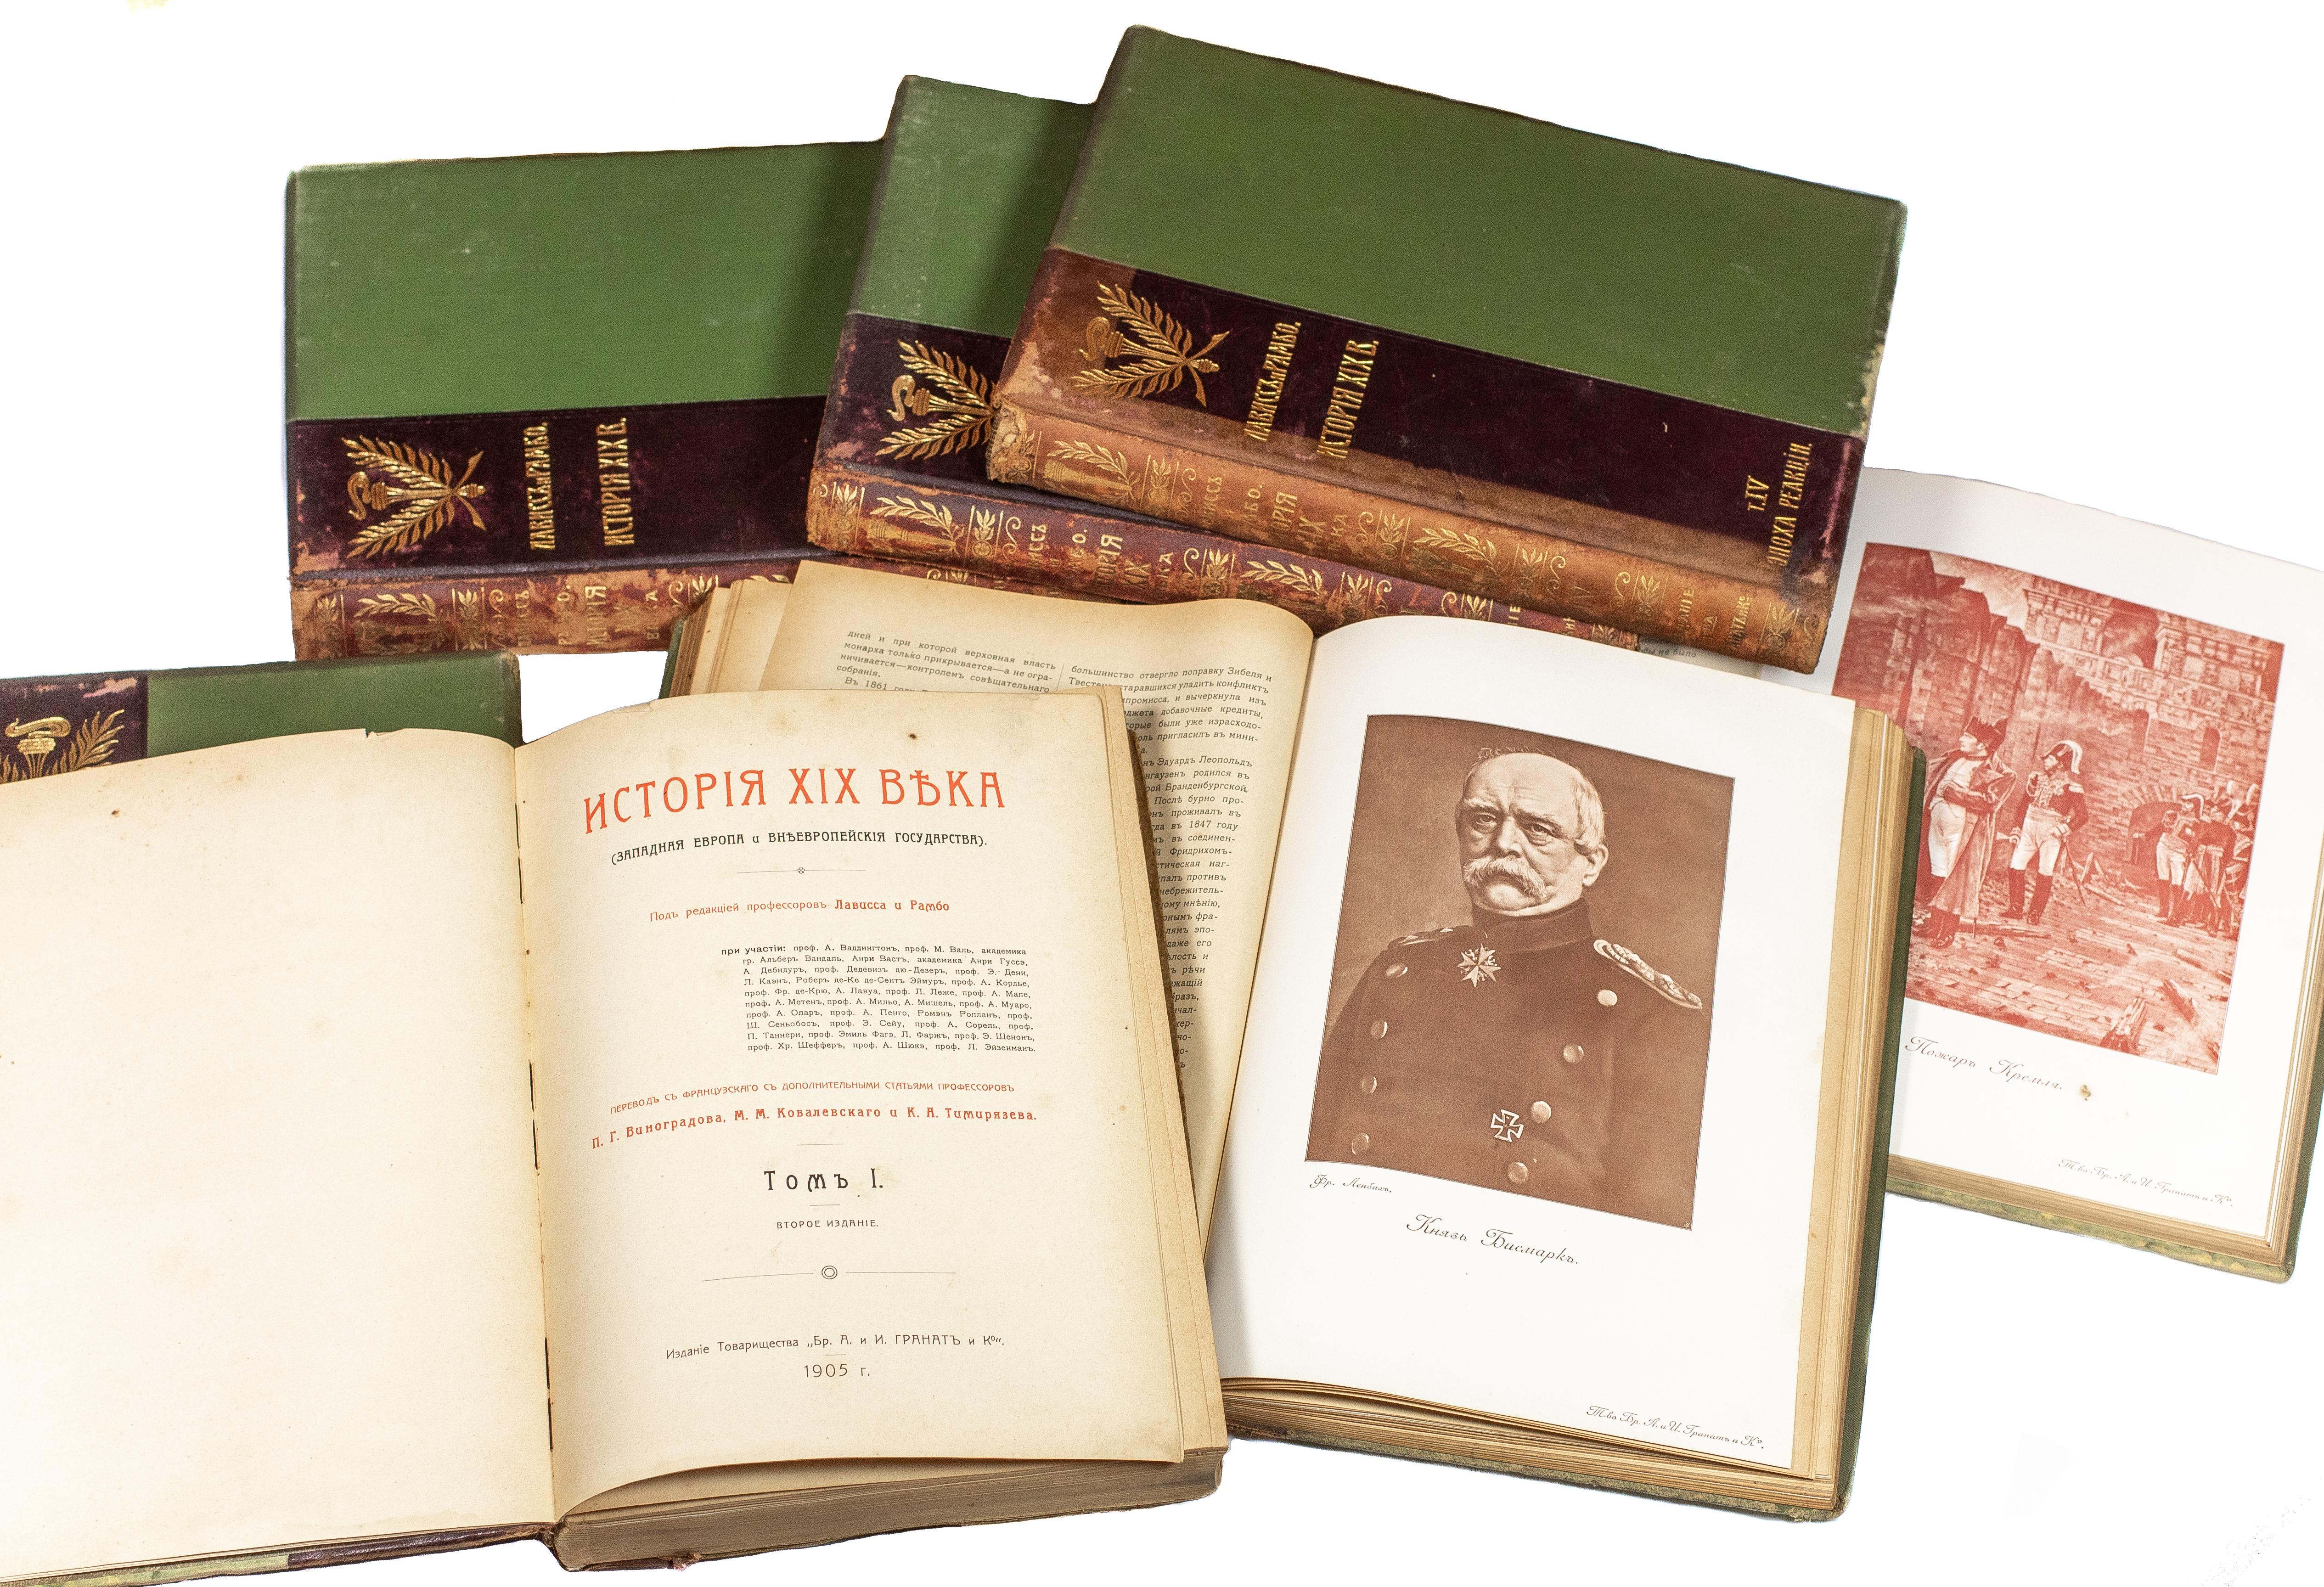 Lot 455 - LAVISSE & RAMBAUD. Histoire du XIX siècle. Moscou, Granat, 1905-1907. 8 vol. in-4°, [...]